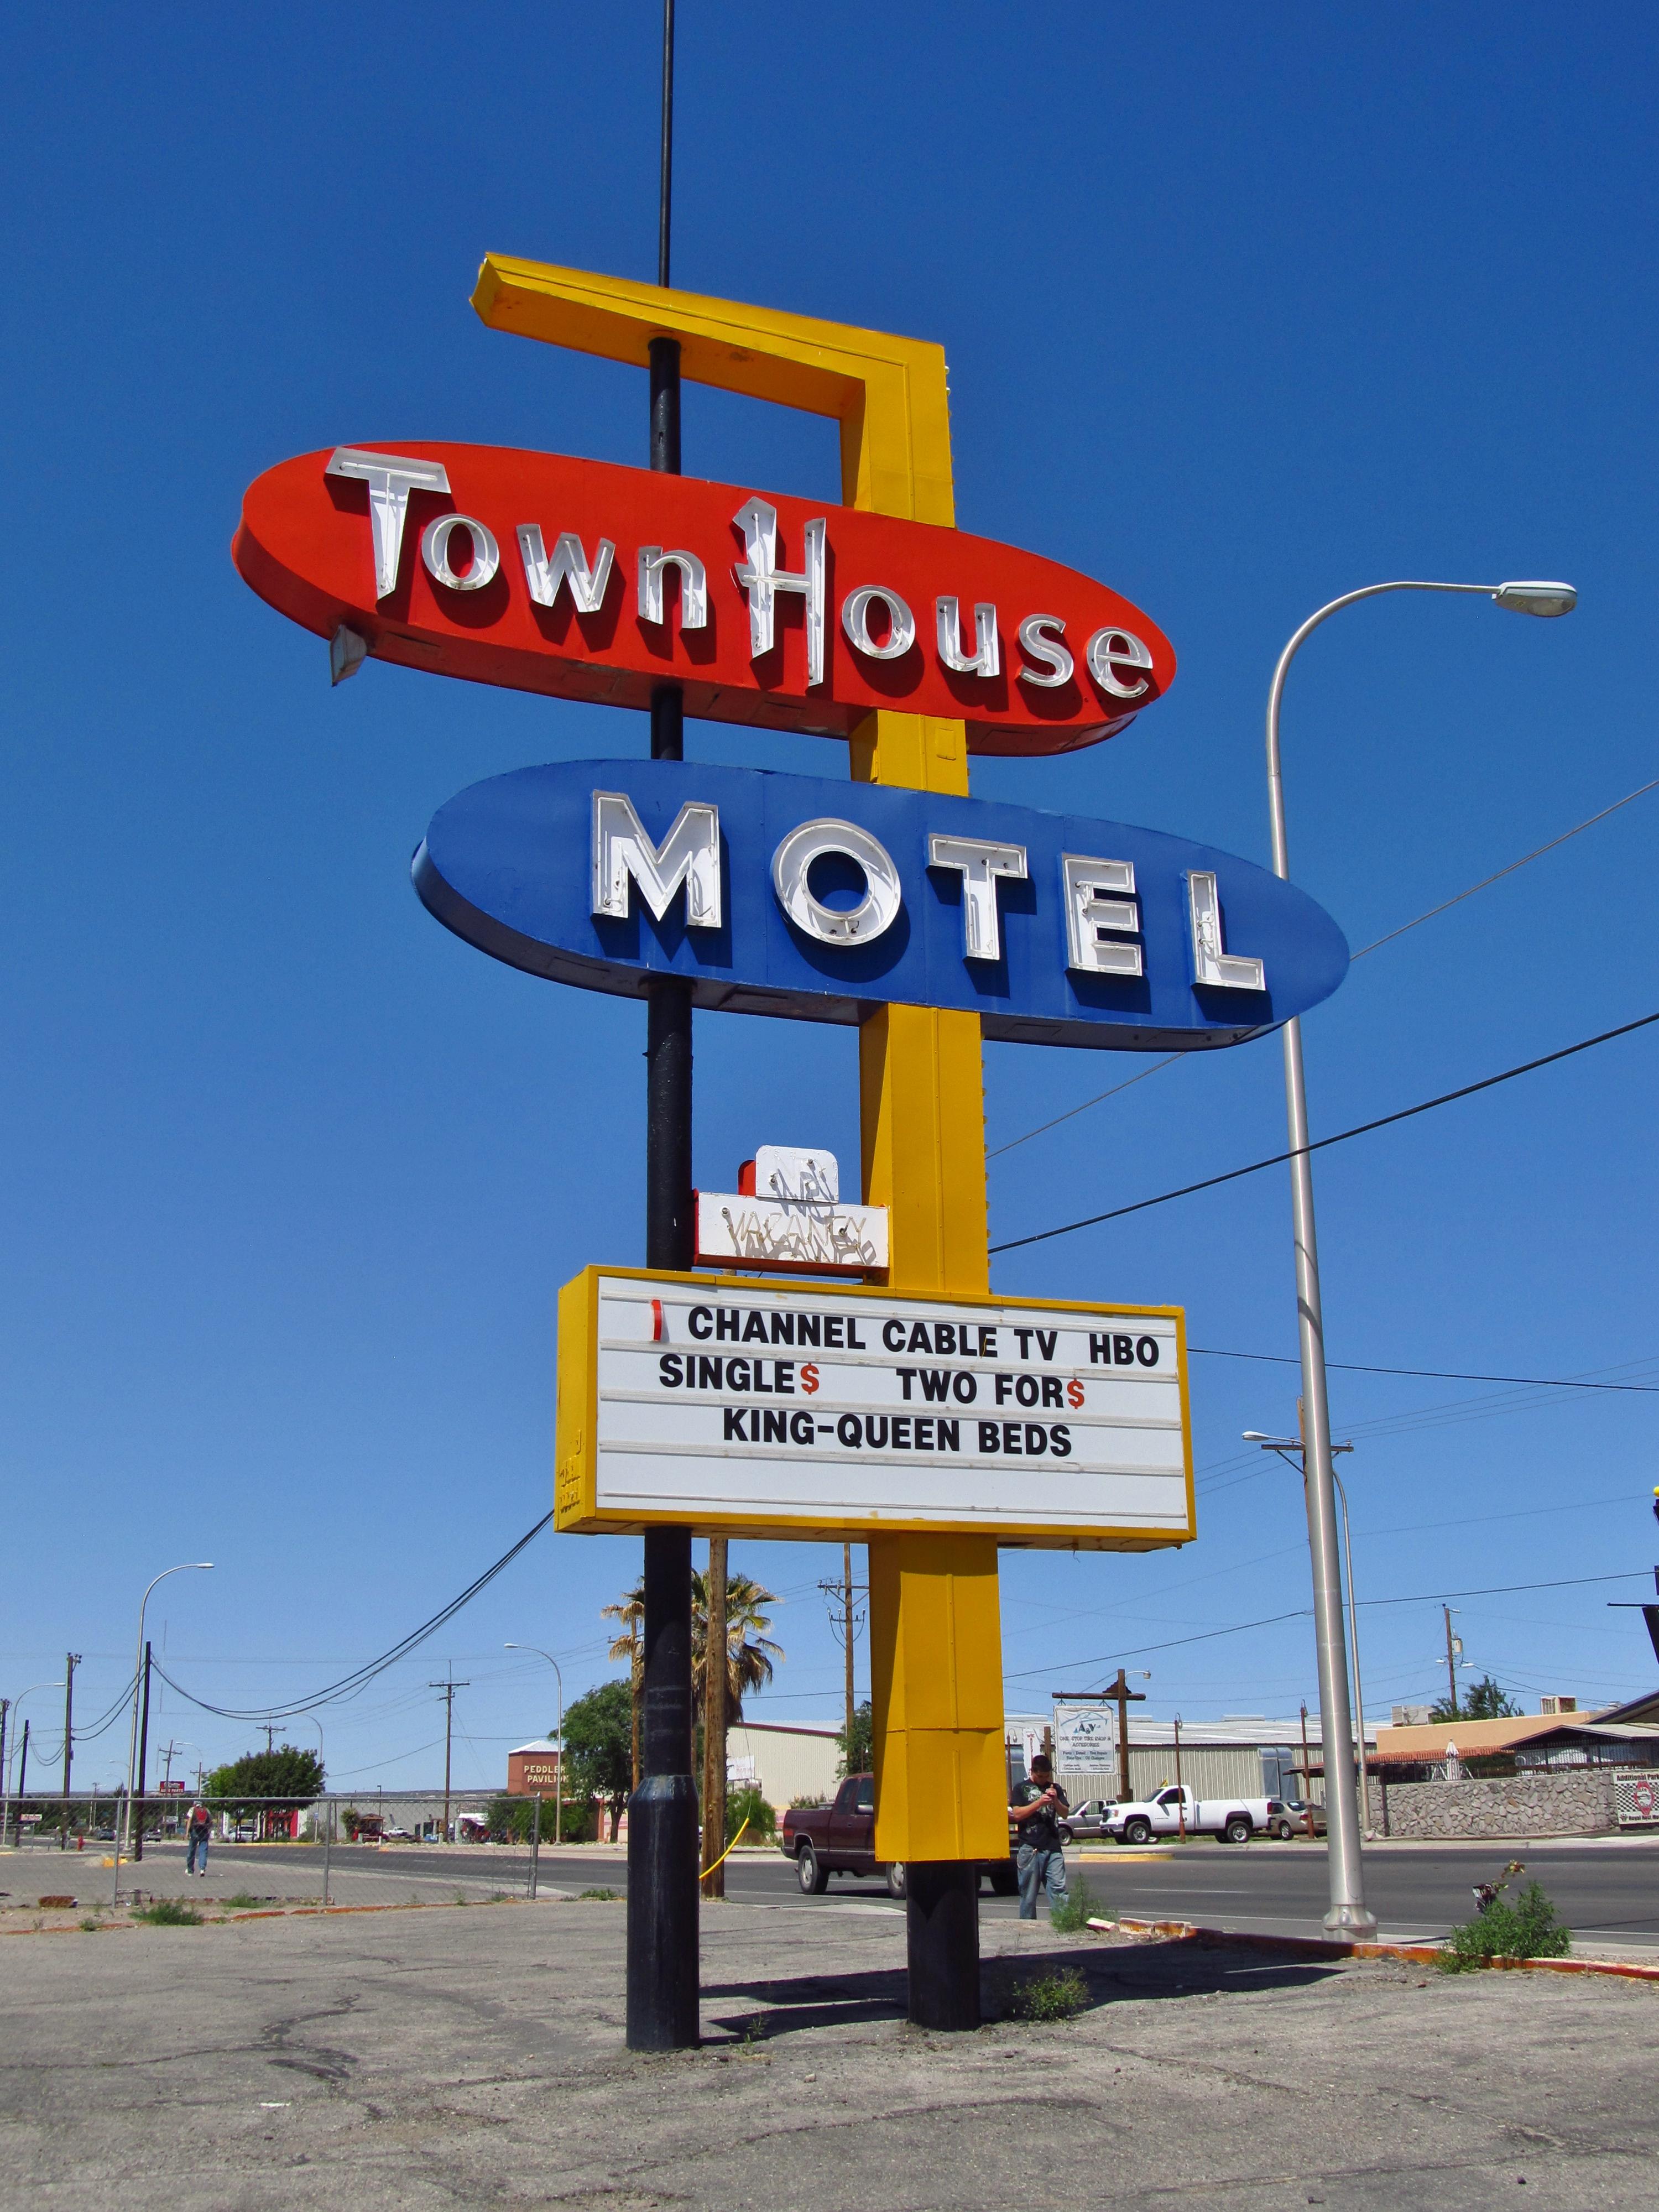 Town House Motel - 2205 West Picacho Avenue, Las Cruces, New Mexico U.S.A. - April 22, 2015